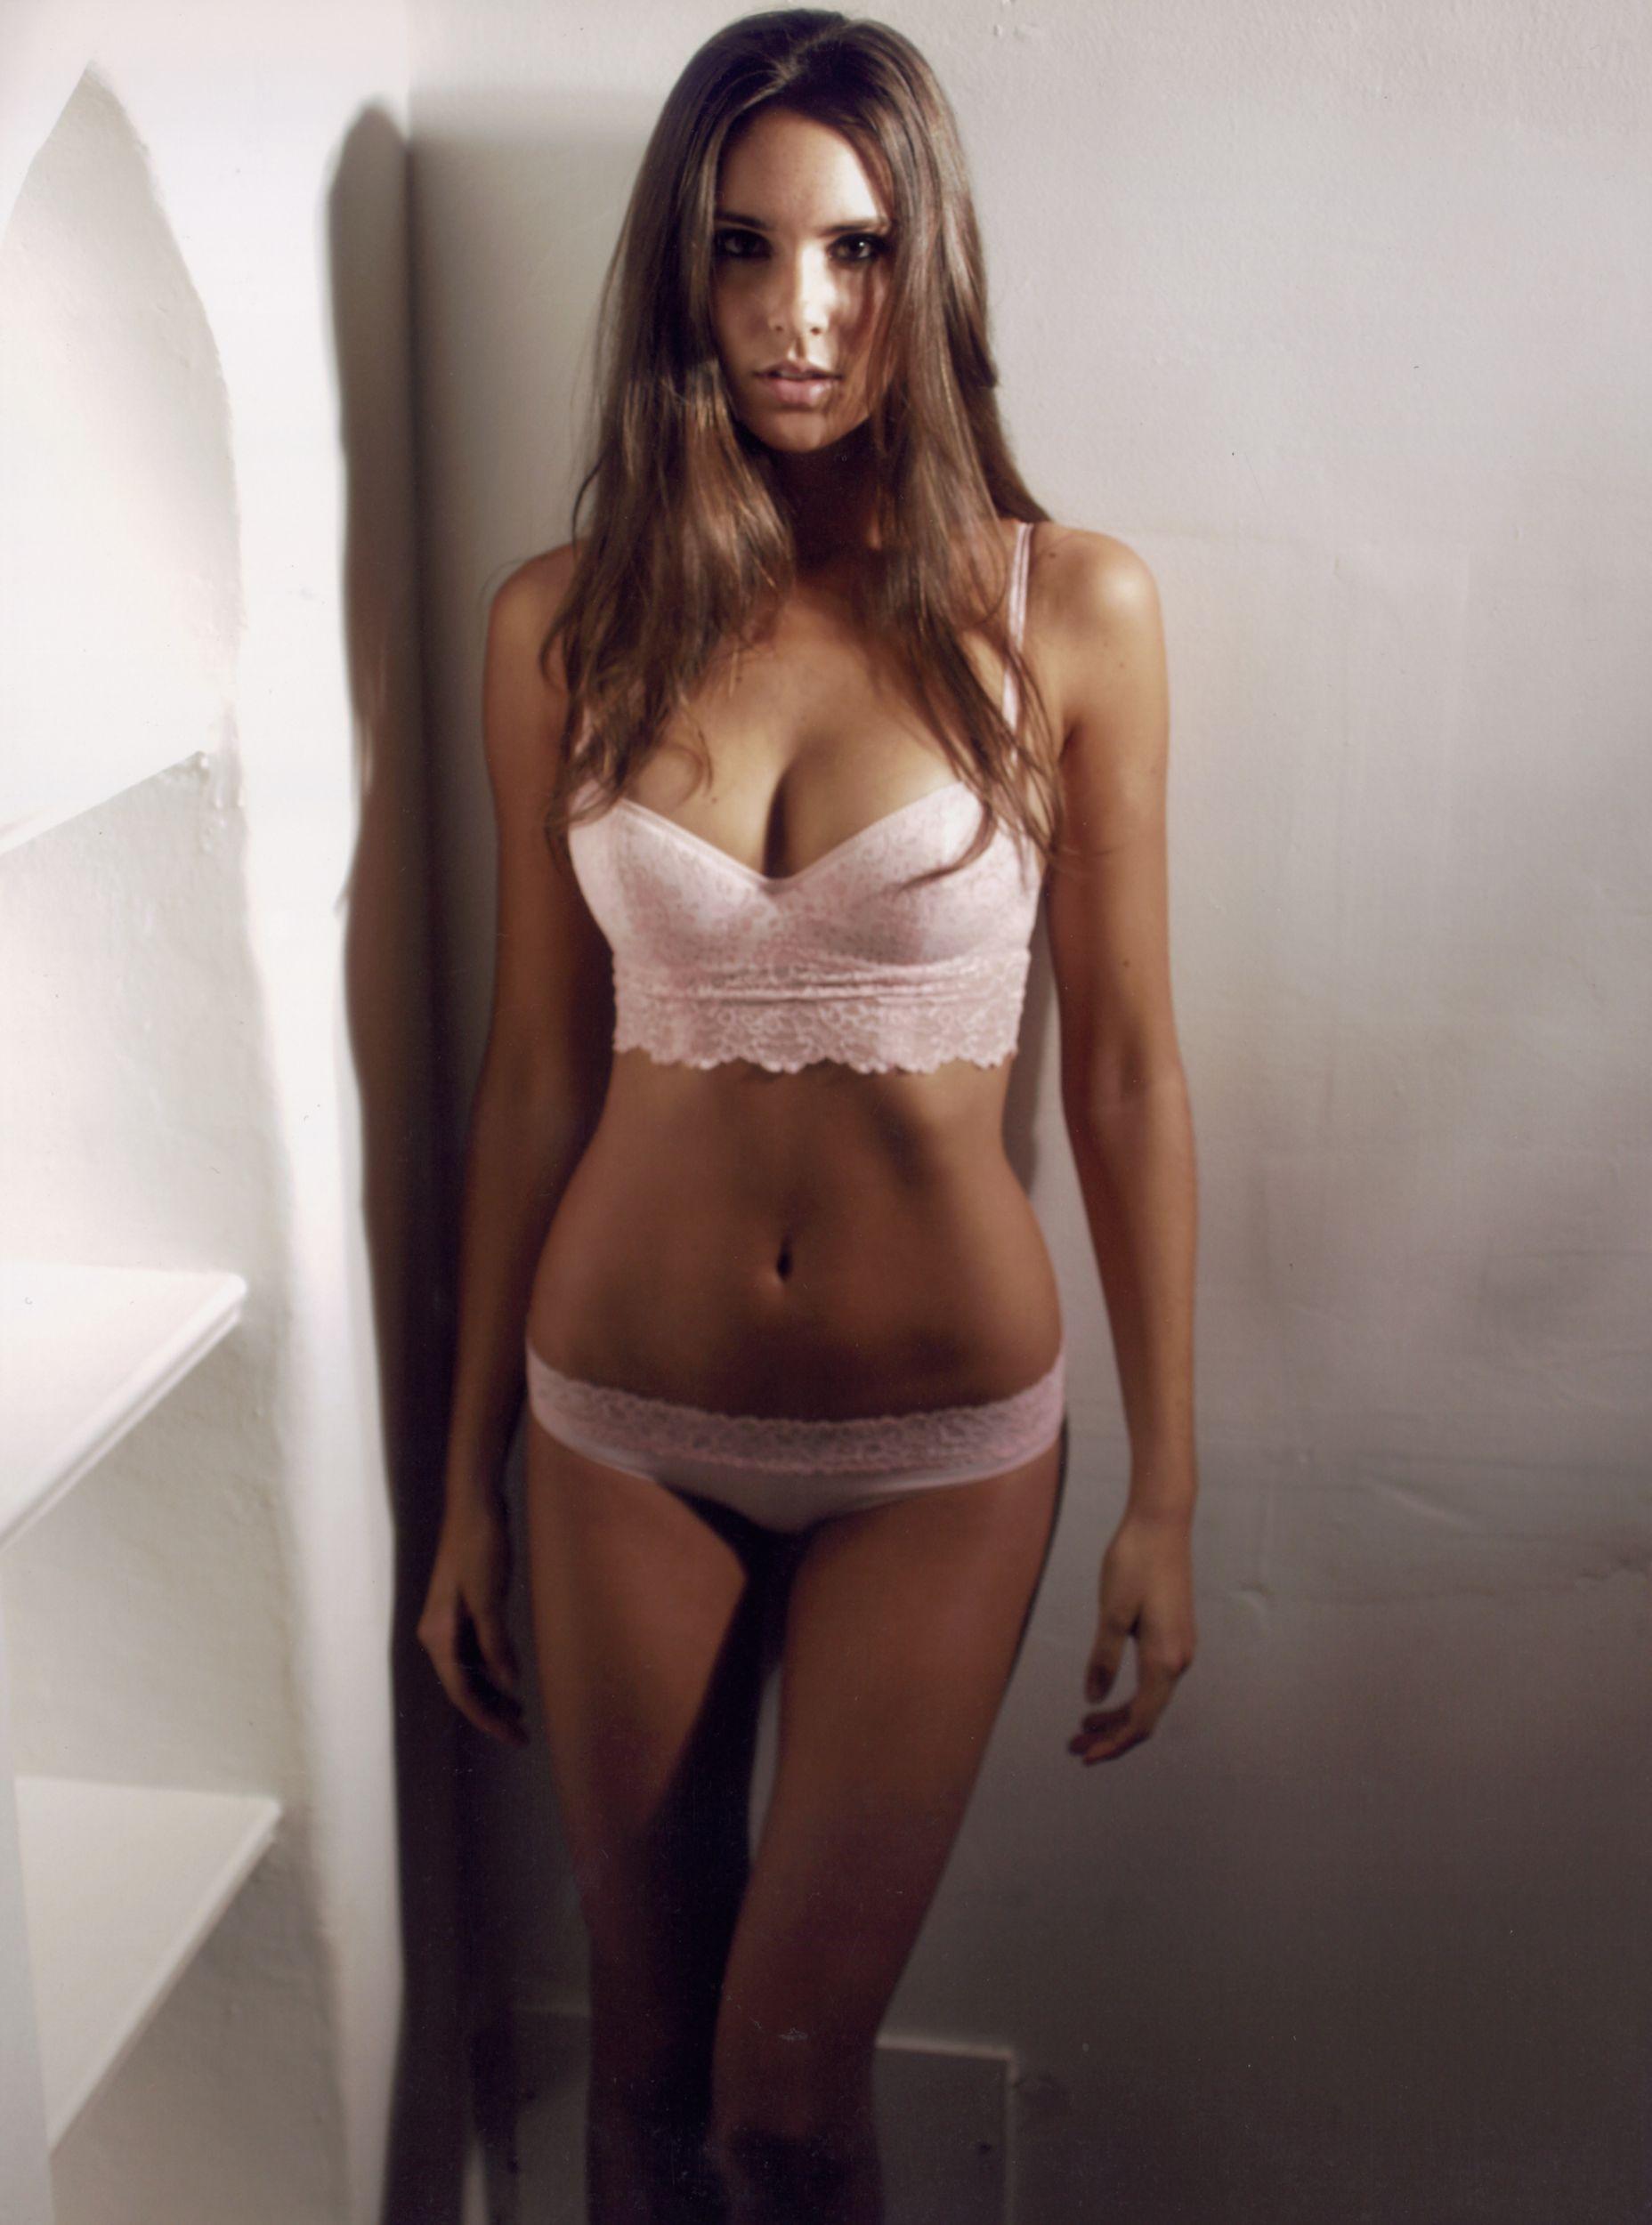 Katie Savoy in lingerie